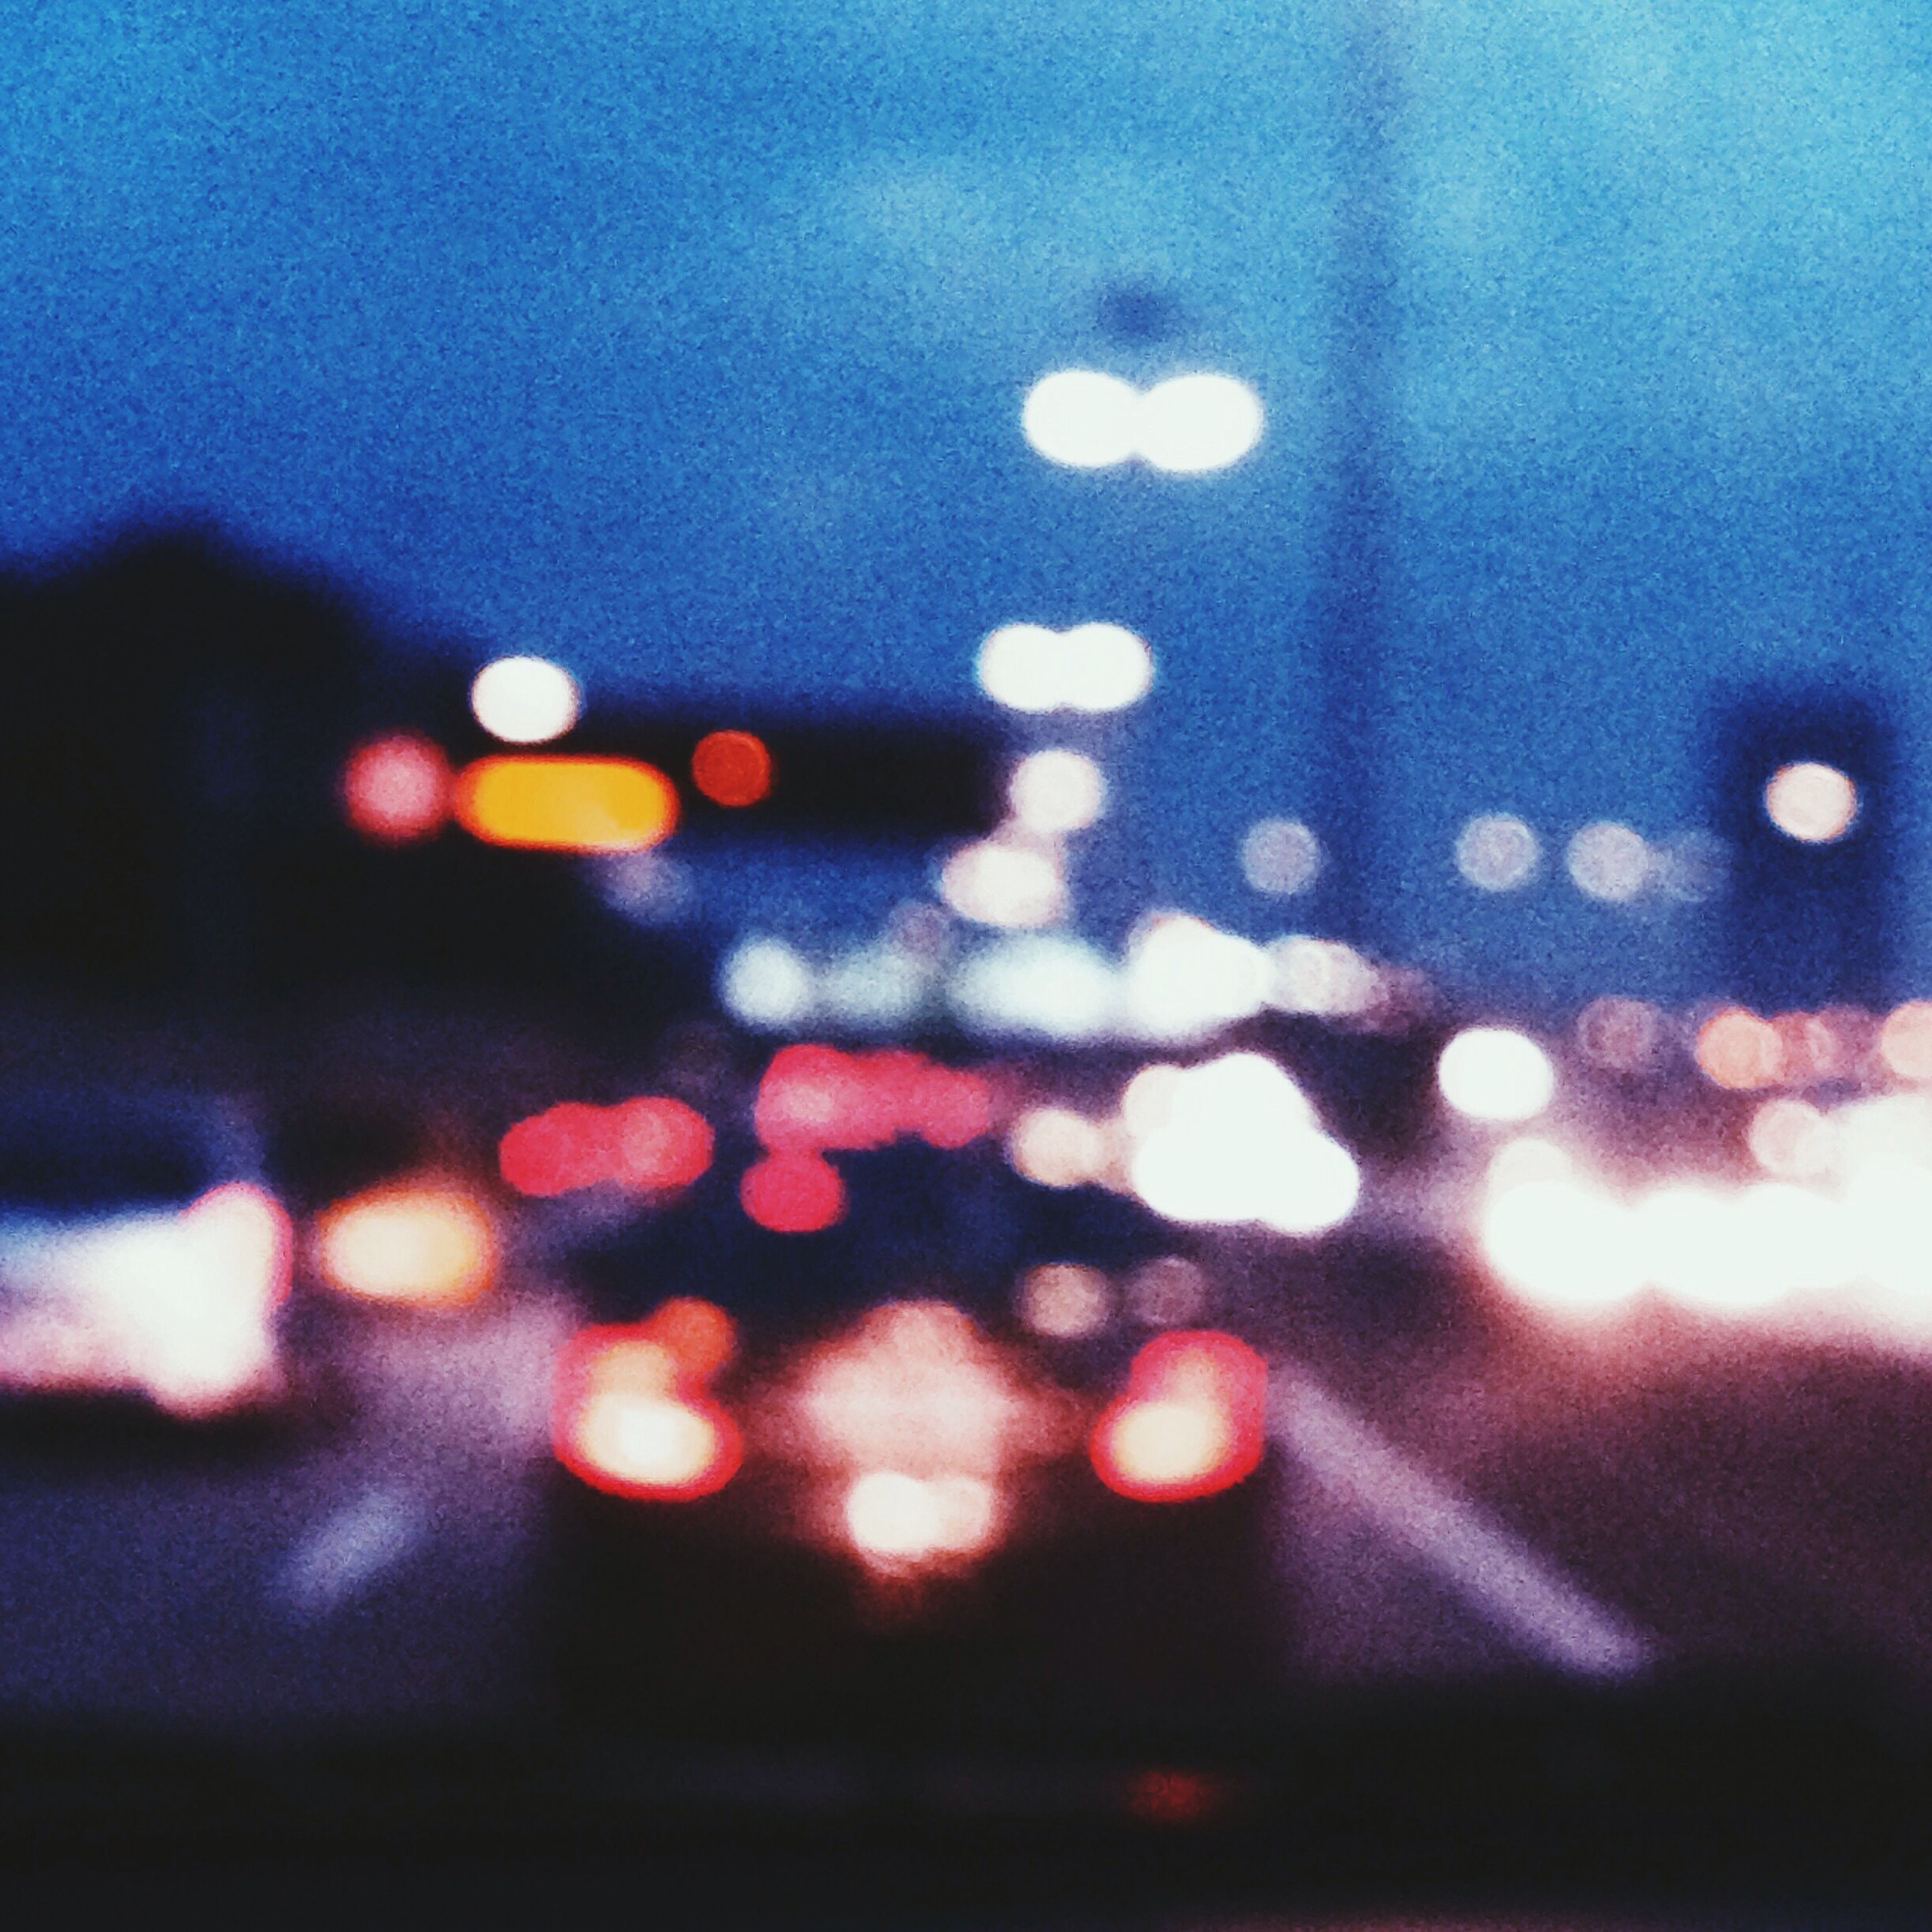 illuminated, defocused, night, light - natural phenomenon, lens flare, transportation, street, lighting equipment, multi colored, sky, road, no people, car, dusk, city, glowing, transparent, light, wet, outdoors